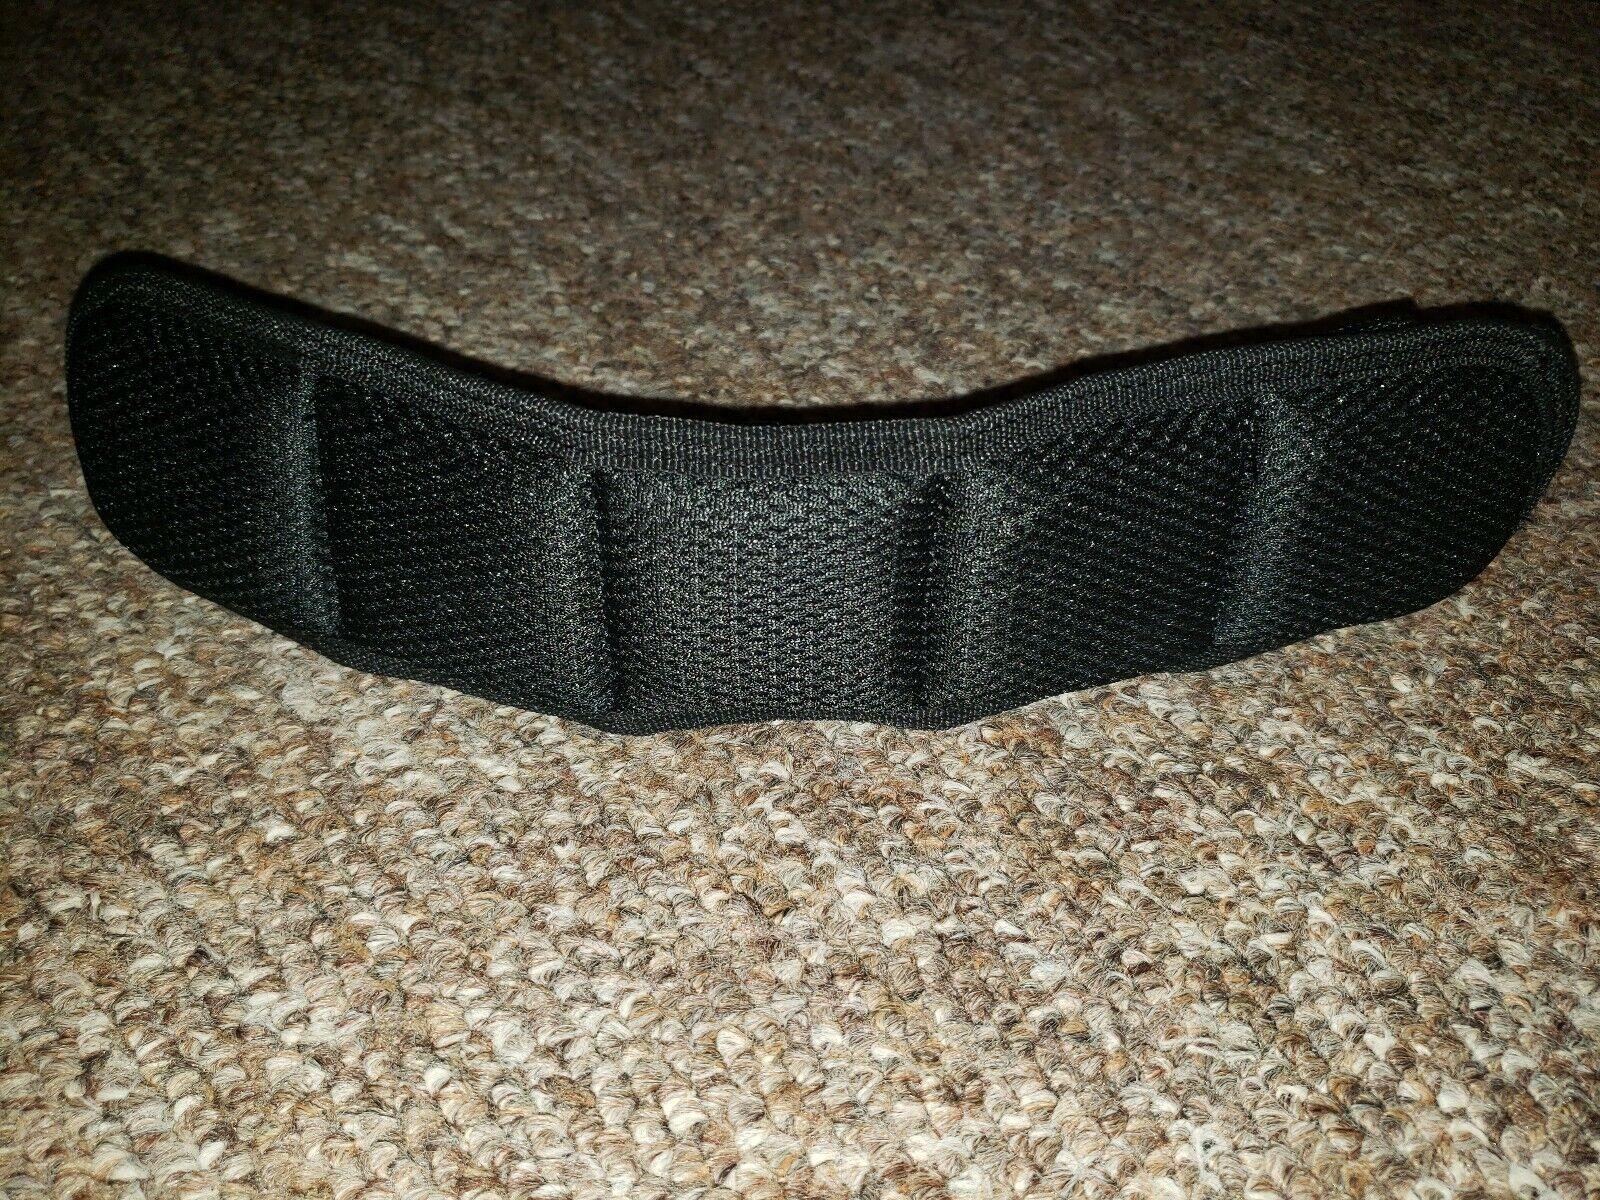 HAZARD 4 ACS-SPAD-BLK Deluxe Shoulder Strap Pad with Molle Top Black